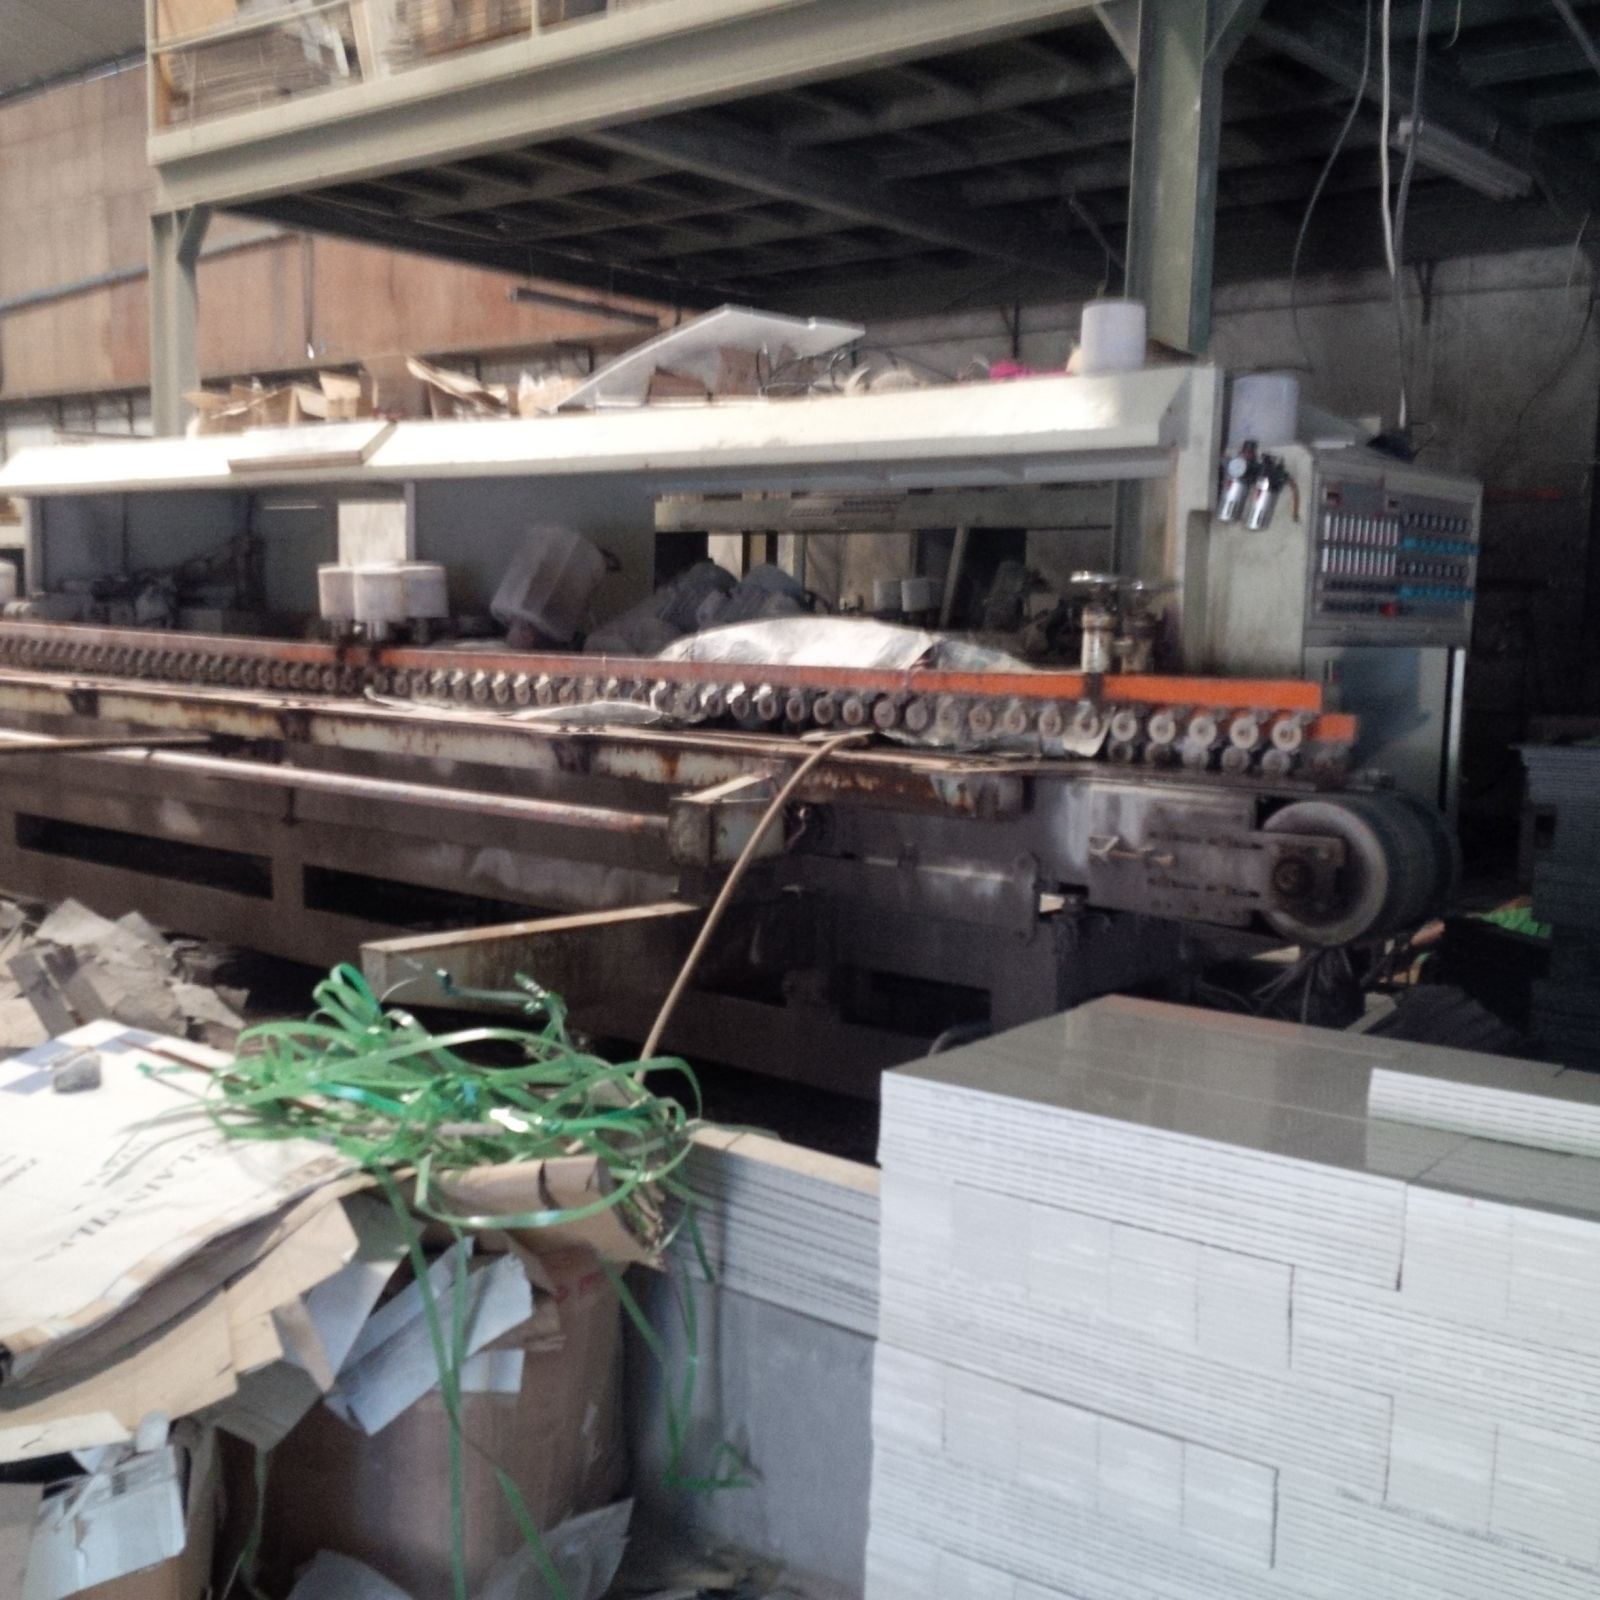 Hasil Jasa Potong Keramik Tile  Stepnos  Bullnose  Bevel Di Pabrik Jakarta  Jasa Potong